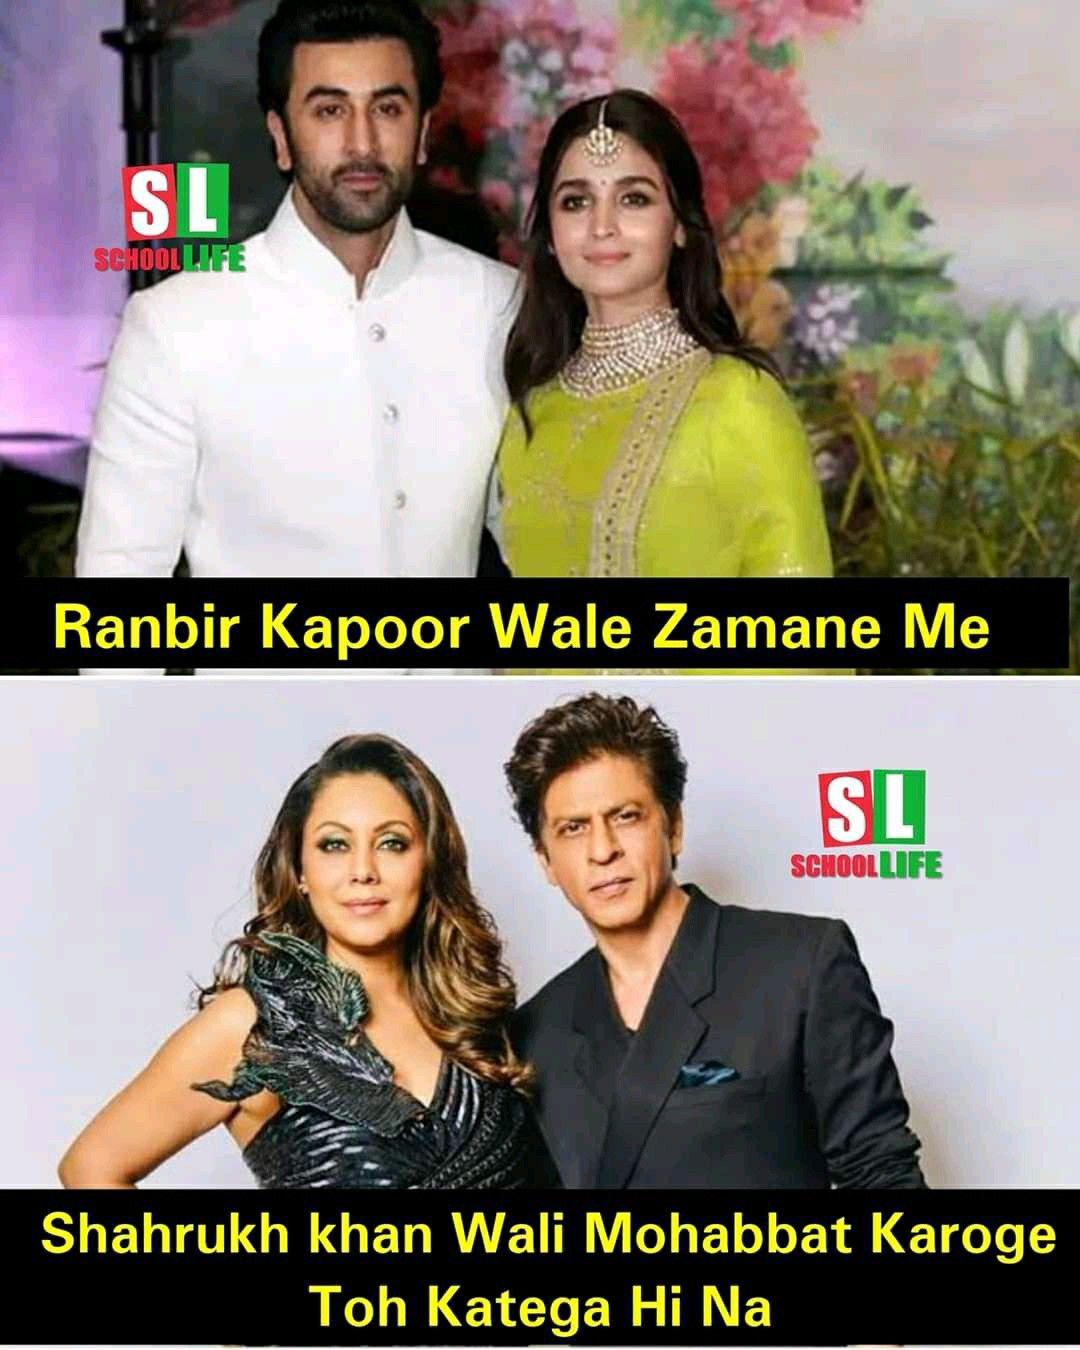 Pin By Juli On Memes Most Hilarious Memes Celebrity Memes Ranbir Kapoor